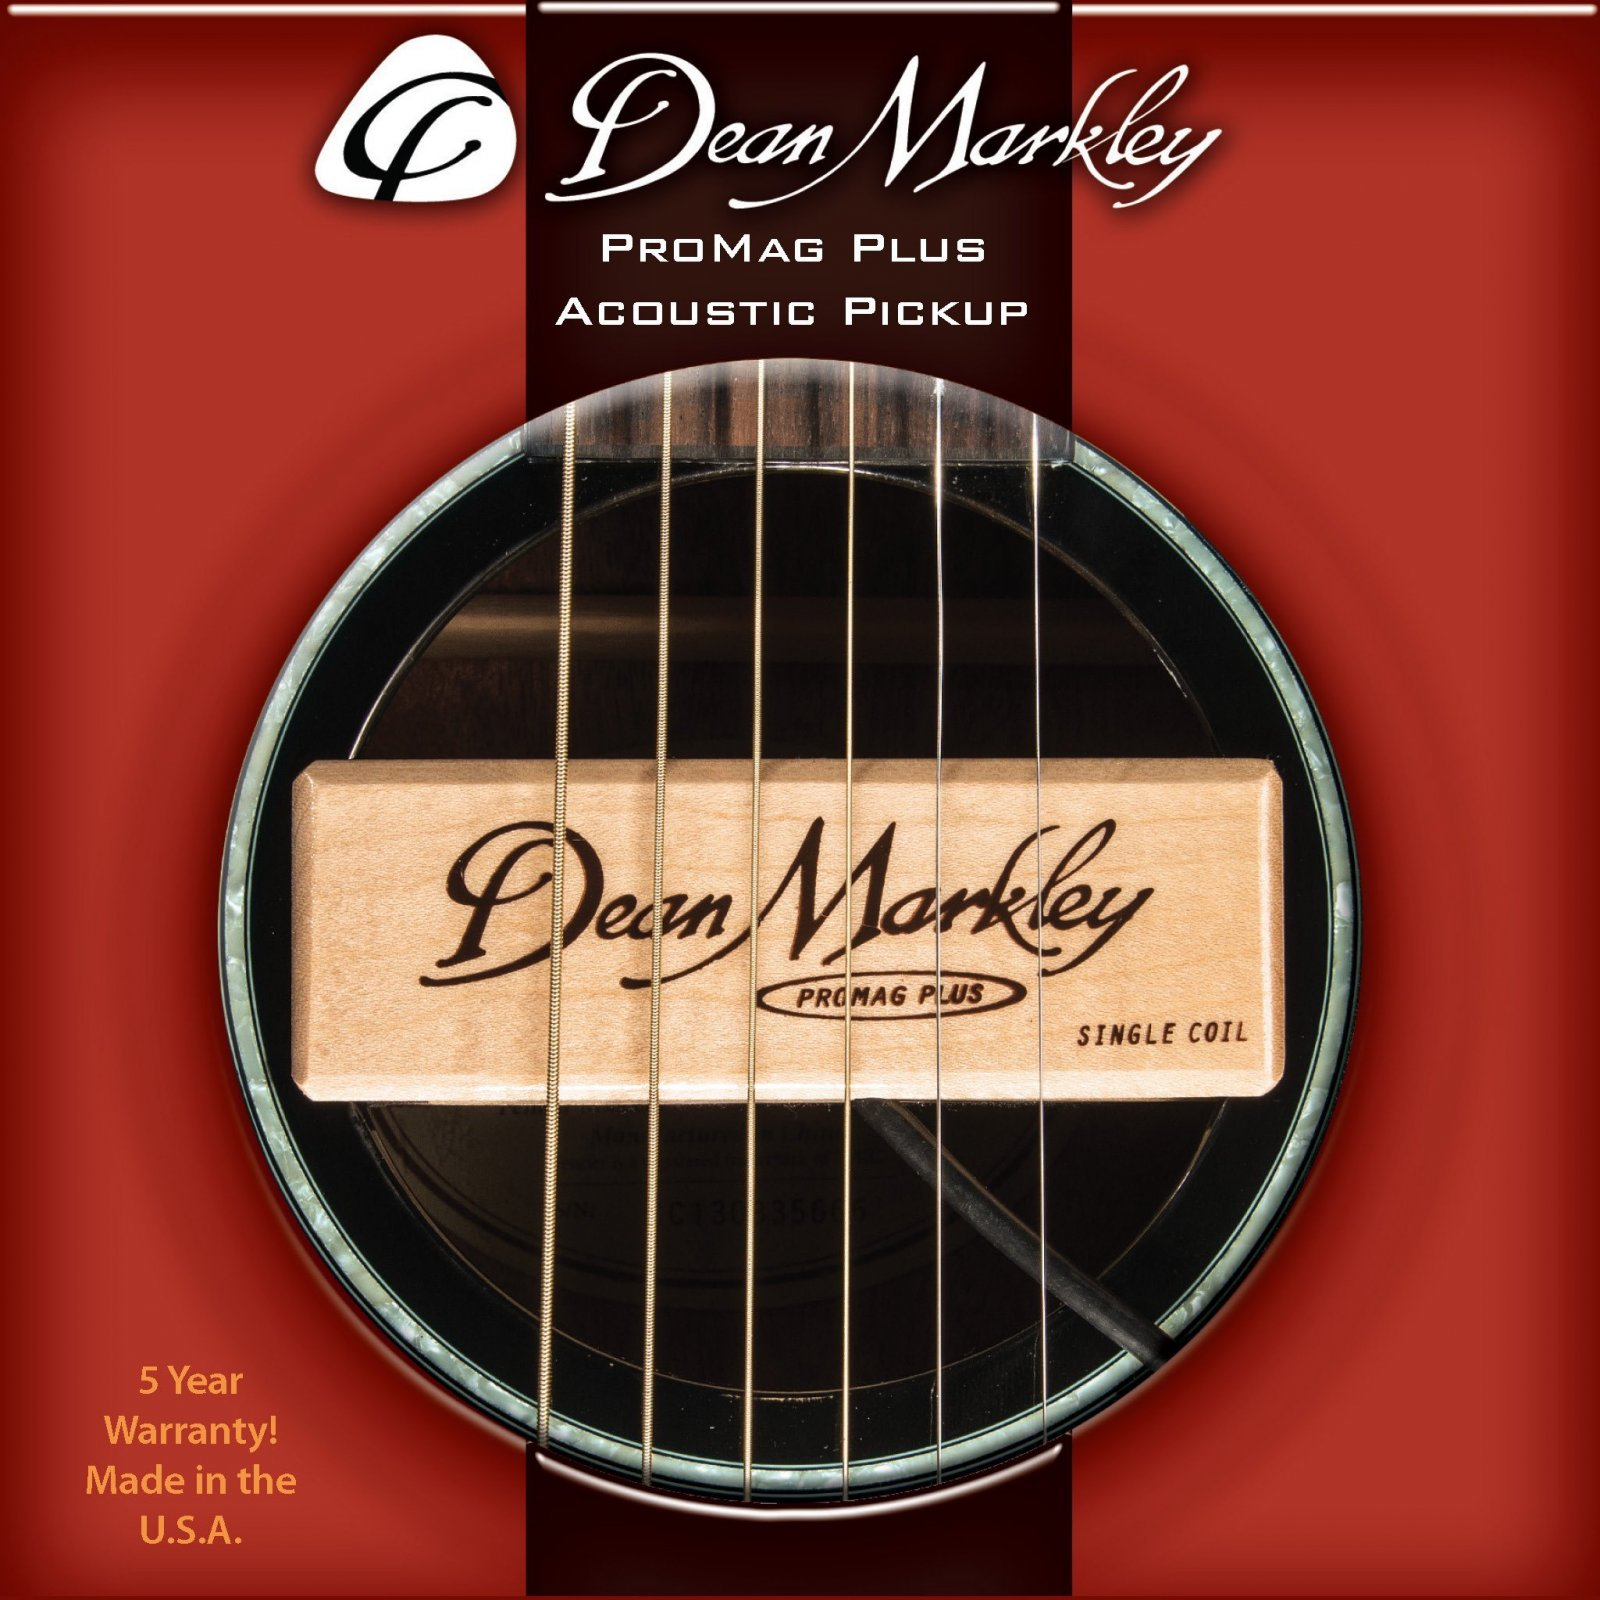 Dean Markley ProMag Acoustic Pickup